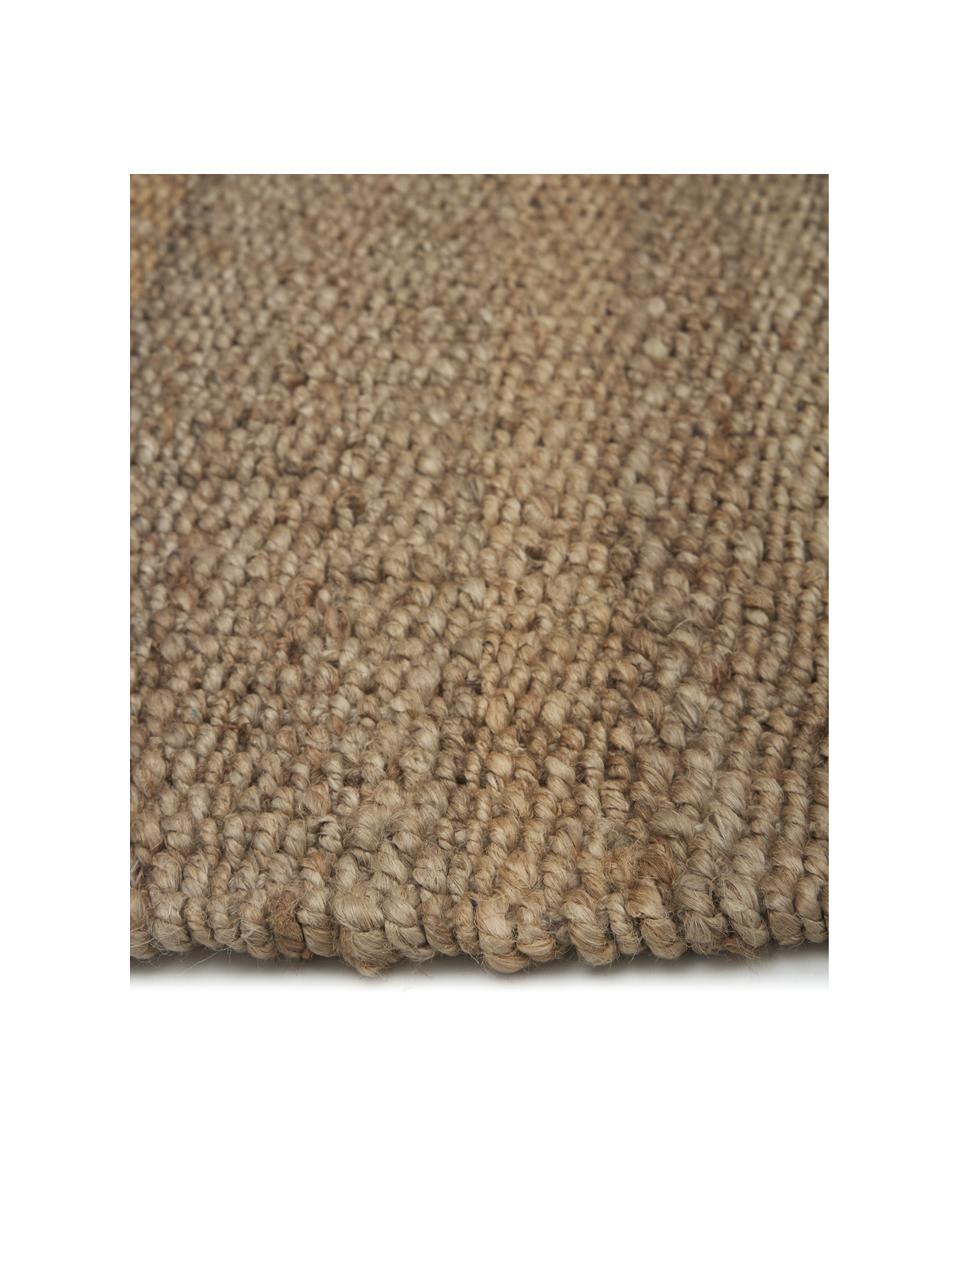 Tappeto in juta taftato a mano con frange Naturals, 100% juta, Juta, Larg. 200 x Lung. 300 cm (taglia L)